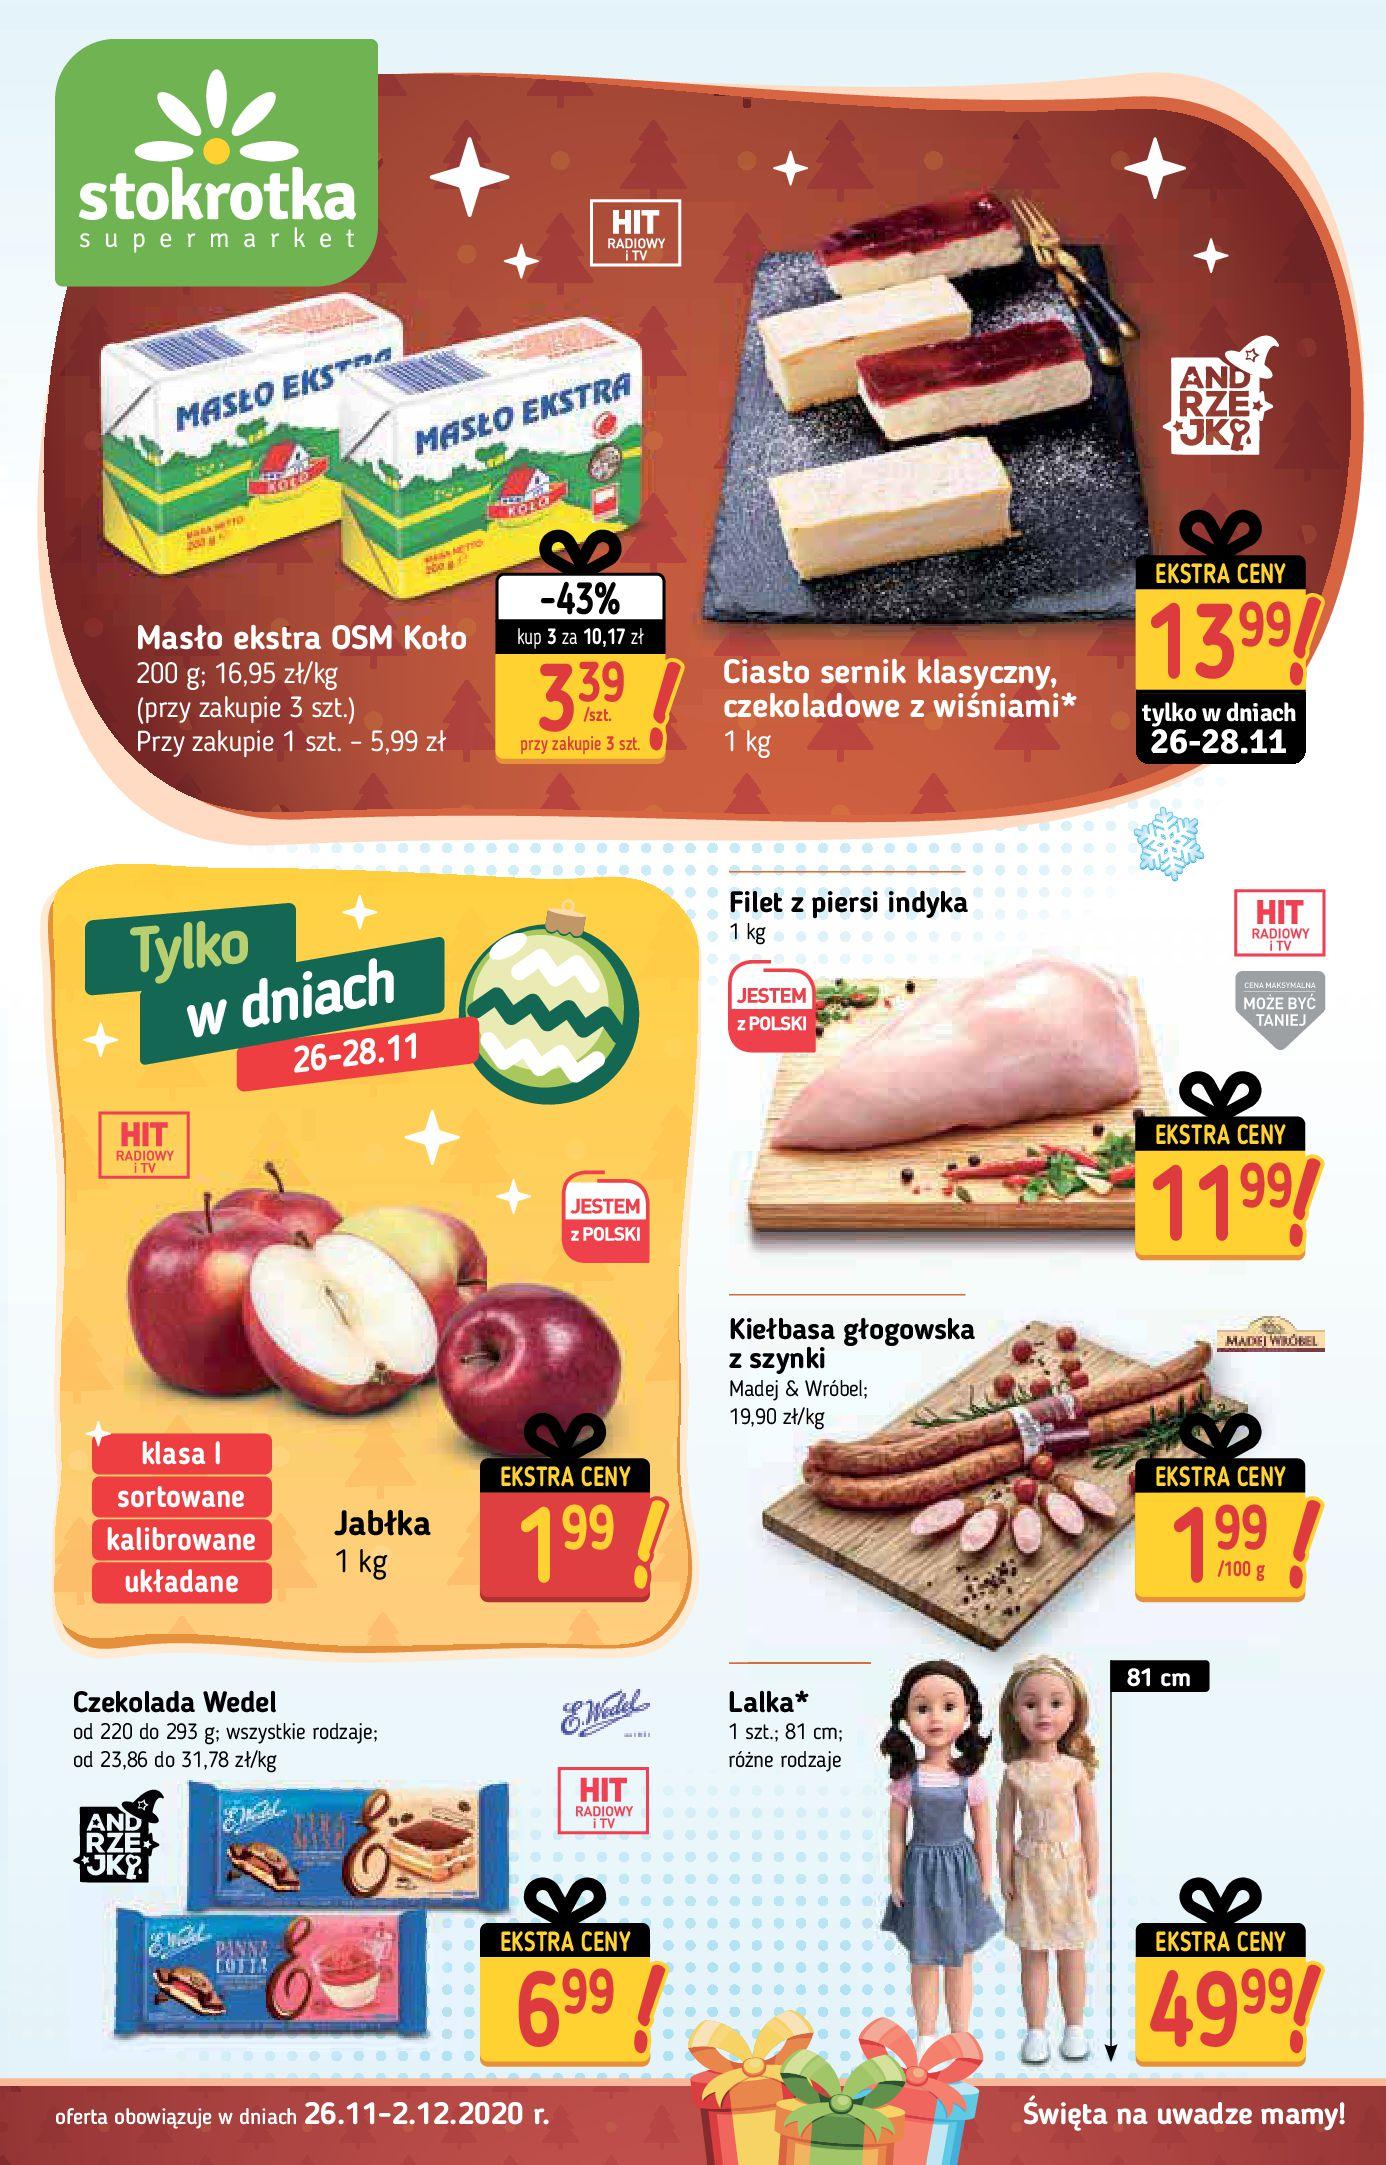 Stokrotka Supermarket:  Oferta handlowa 25.11.2020